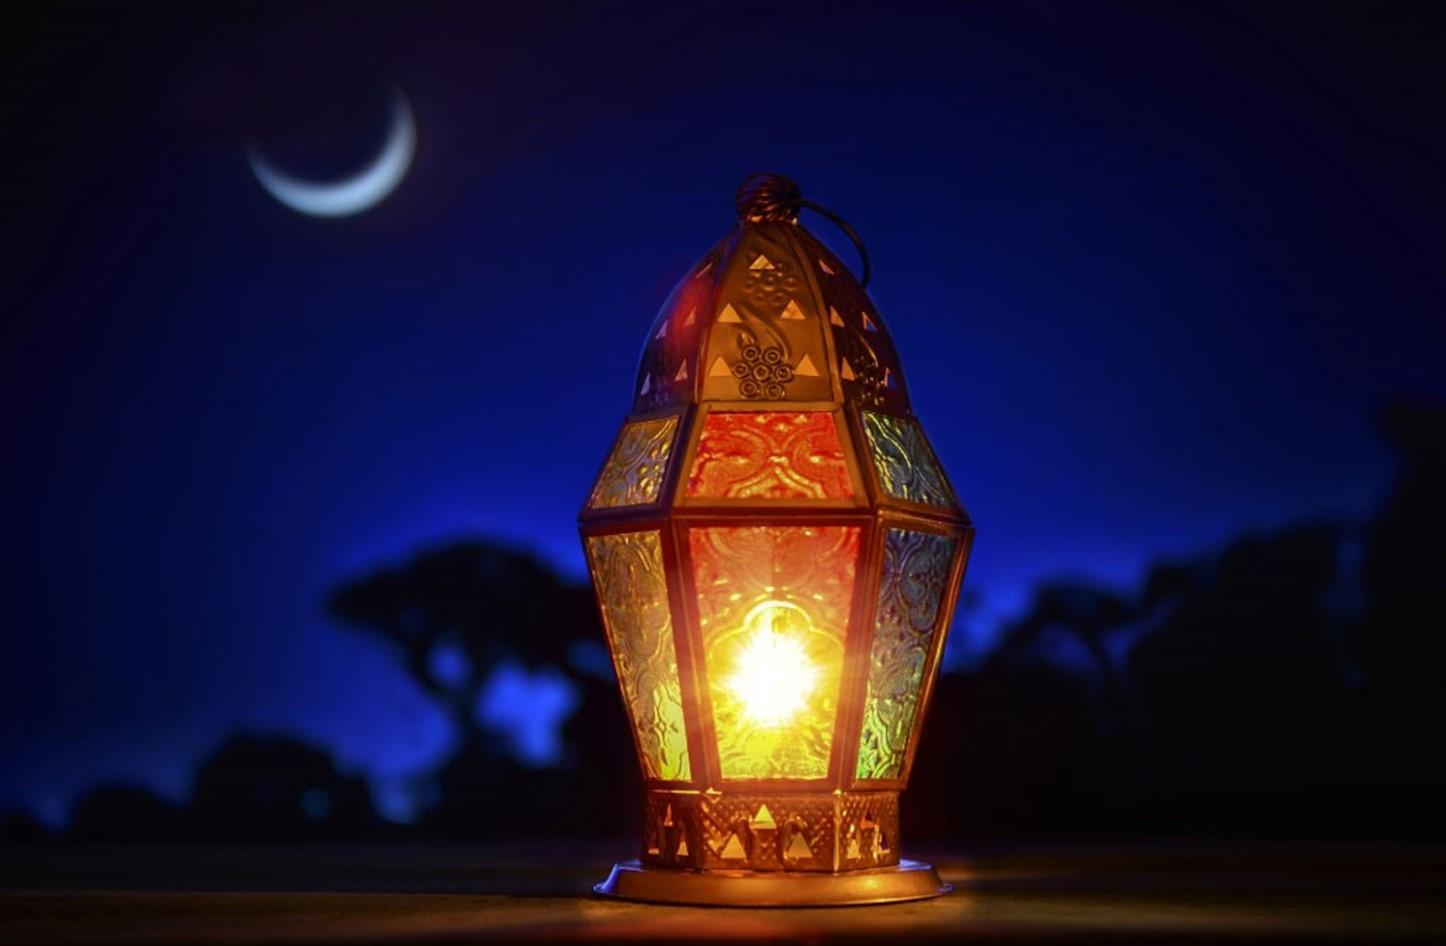 بالصور عبارات عن رمضان , انقى الكلمات عن رمضان 5261 6